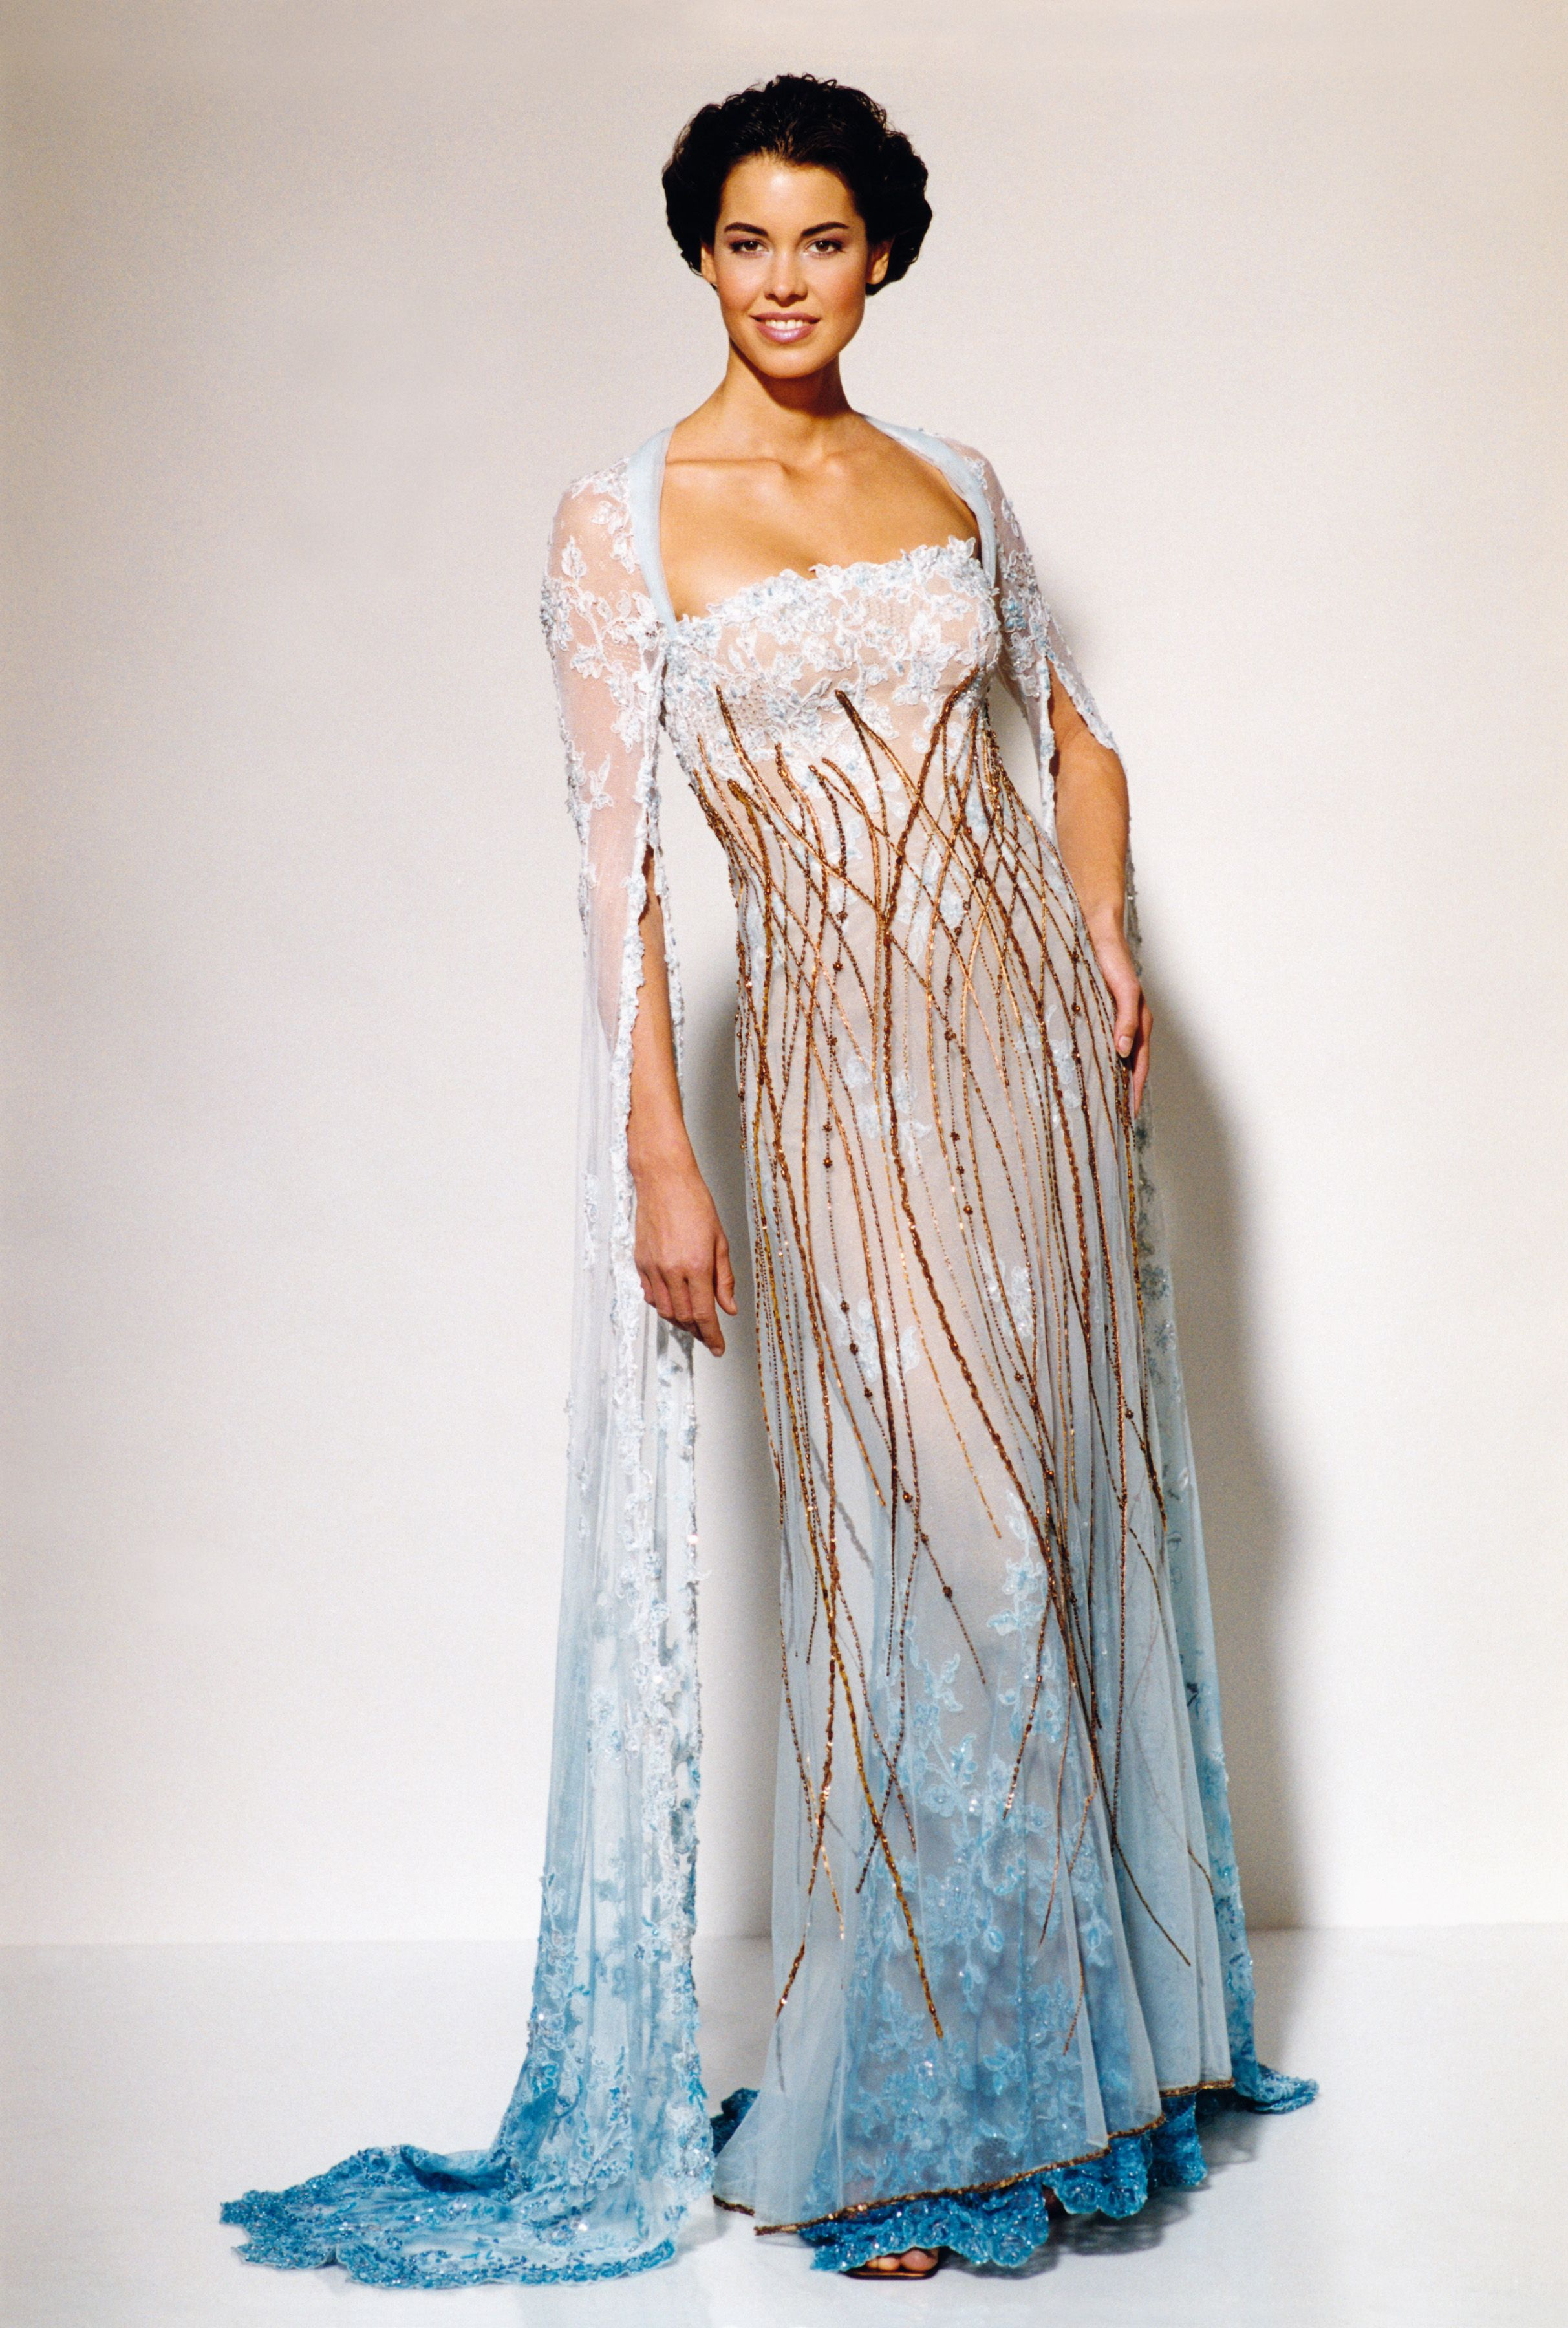 40704ea8e03d Haute Couture šaty Blanky Matragi kolekce k výročí. Haute Couture by Blanka  Matragi